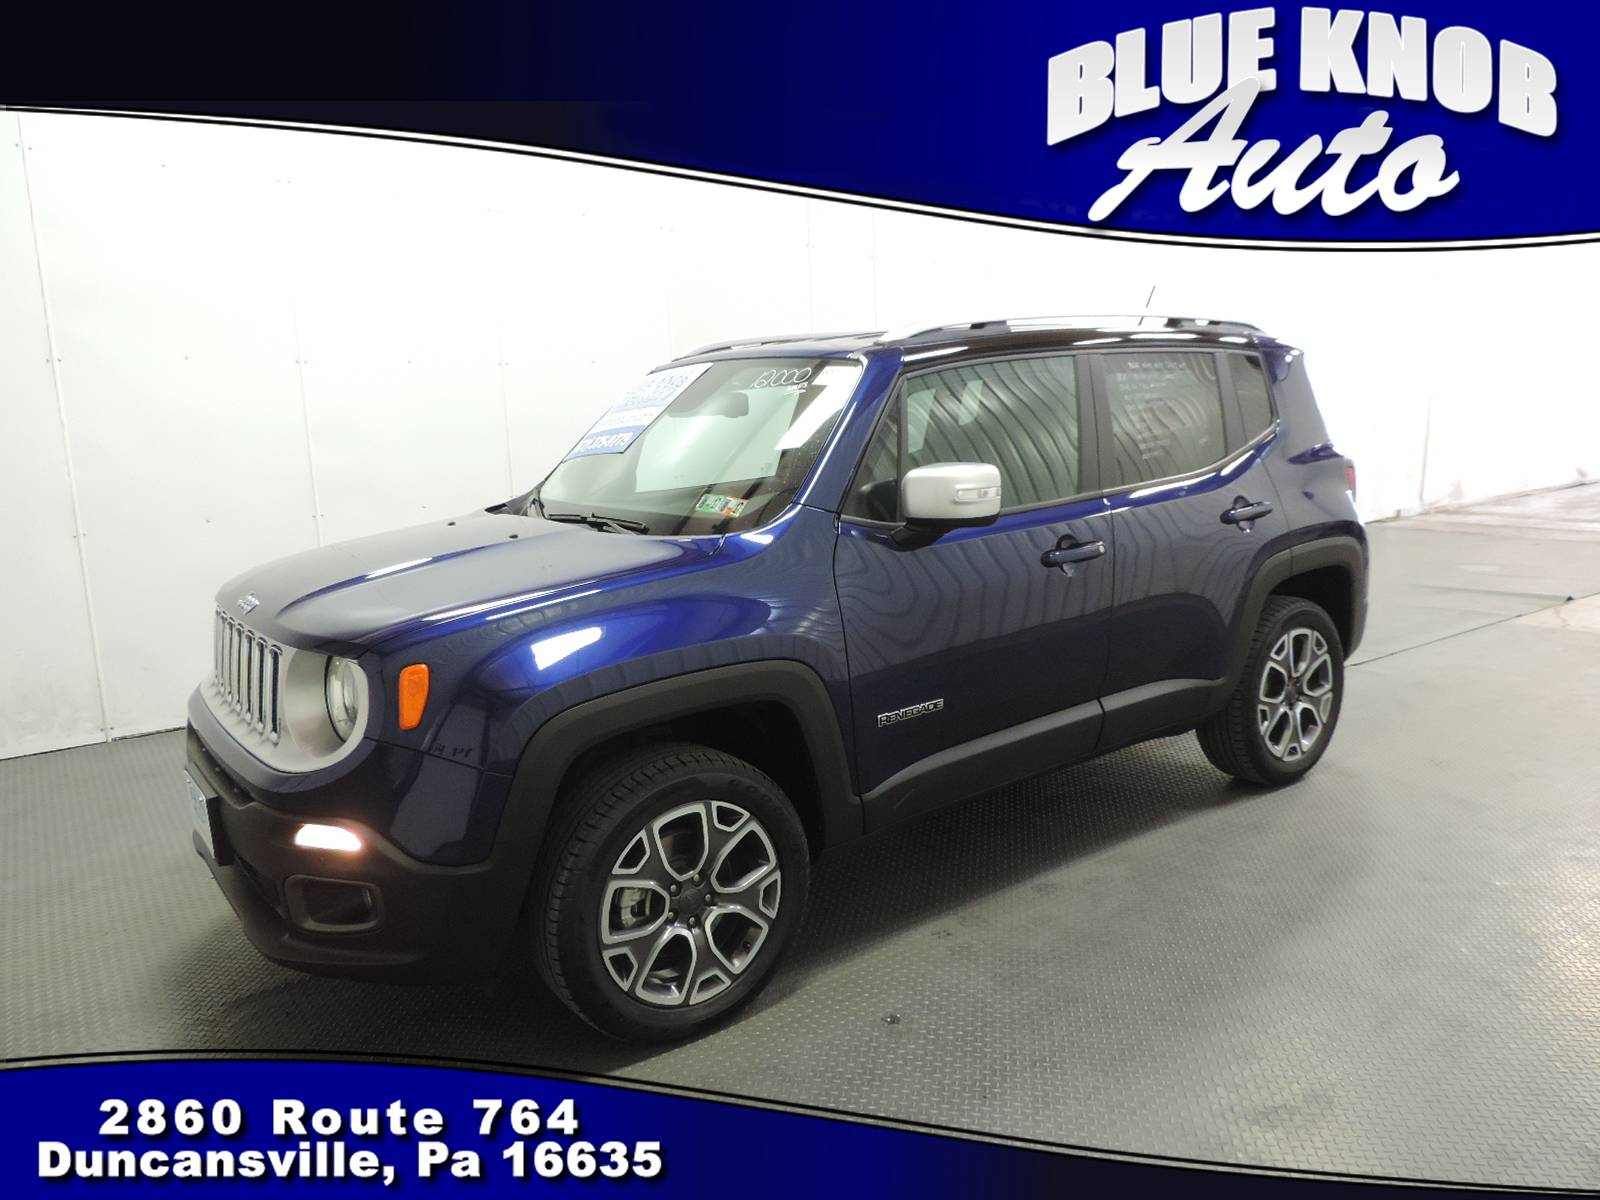 Jeep Renegade Sale Duncansville Zaccjbdt Gpd